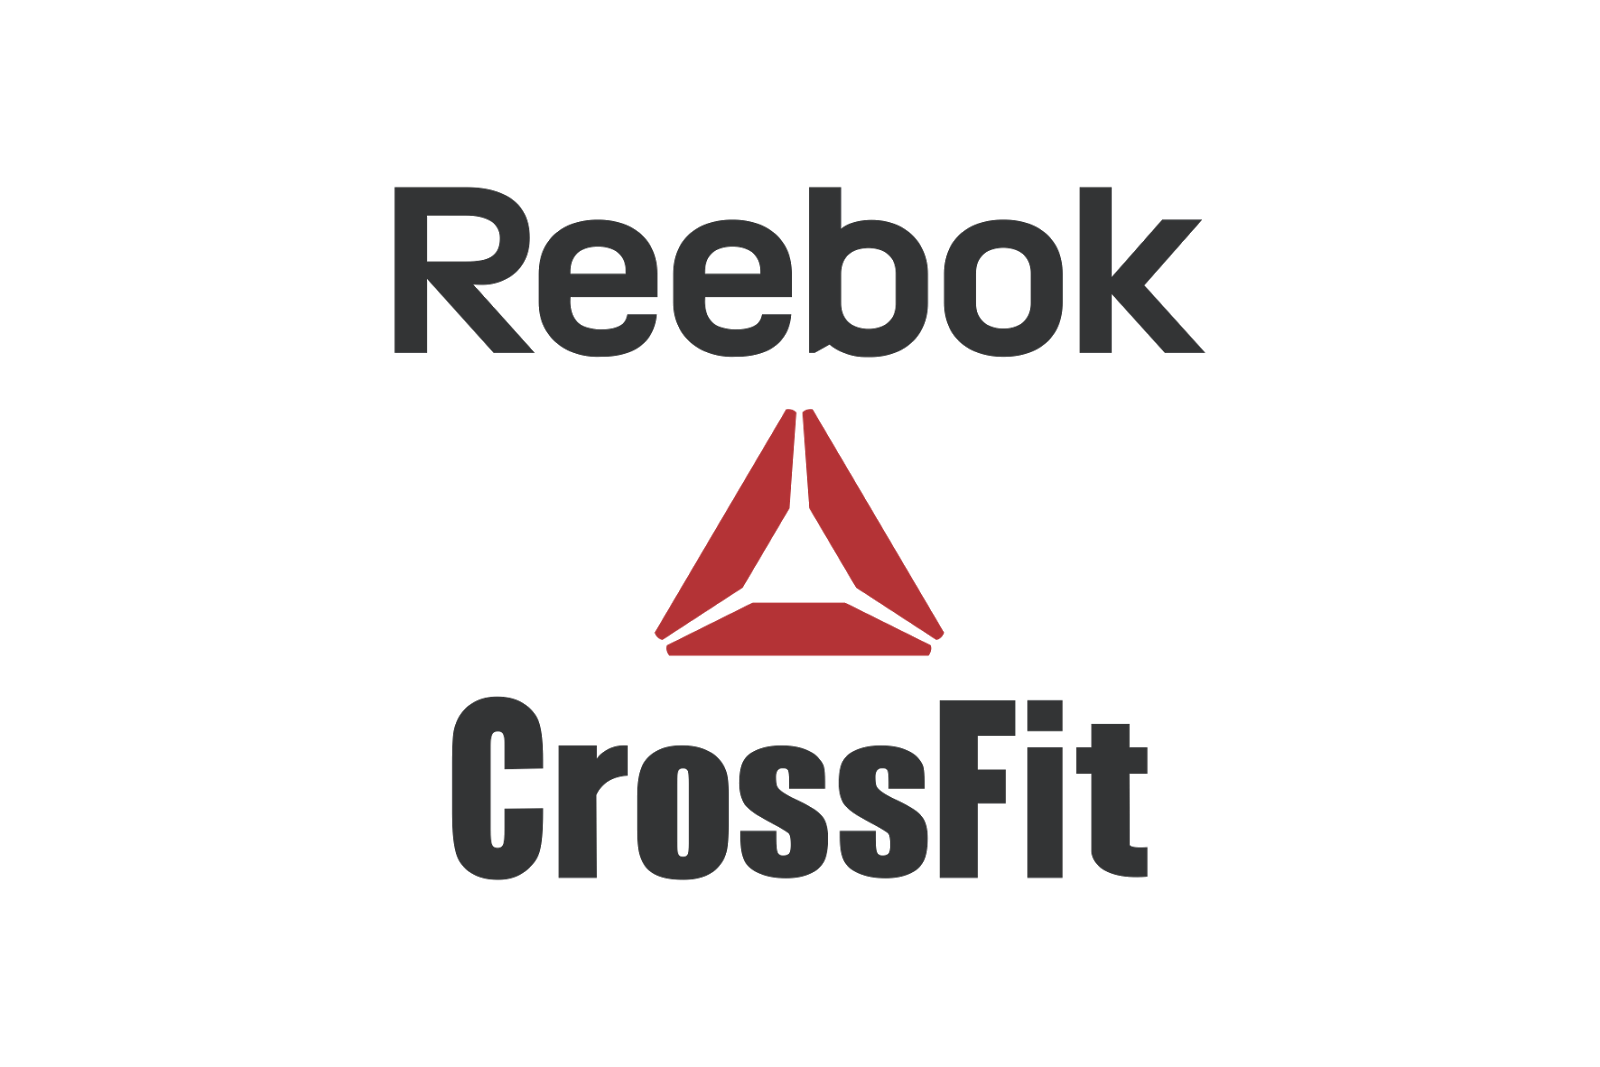 Reebok crossfit logo logo cdr vector reebok crossfit logo buycottarizona Image collections